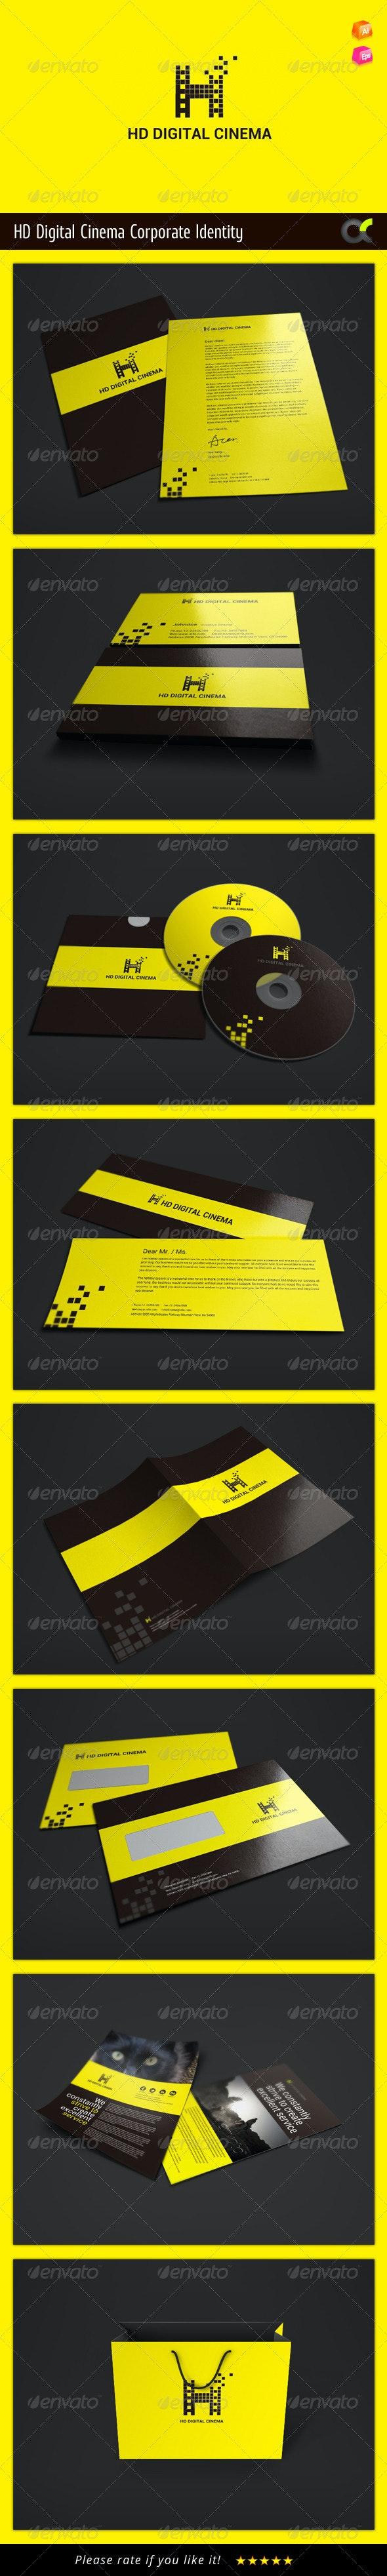 HD Digital Cinema Corporate Identity - Stationery Print Templates